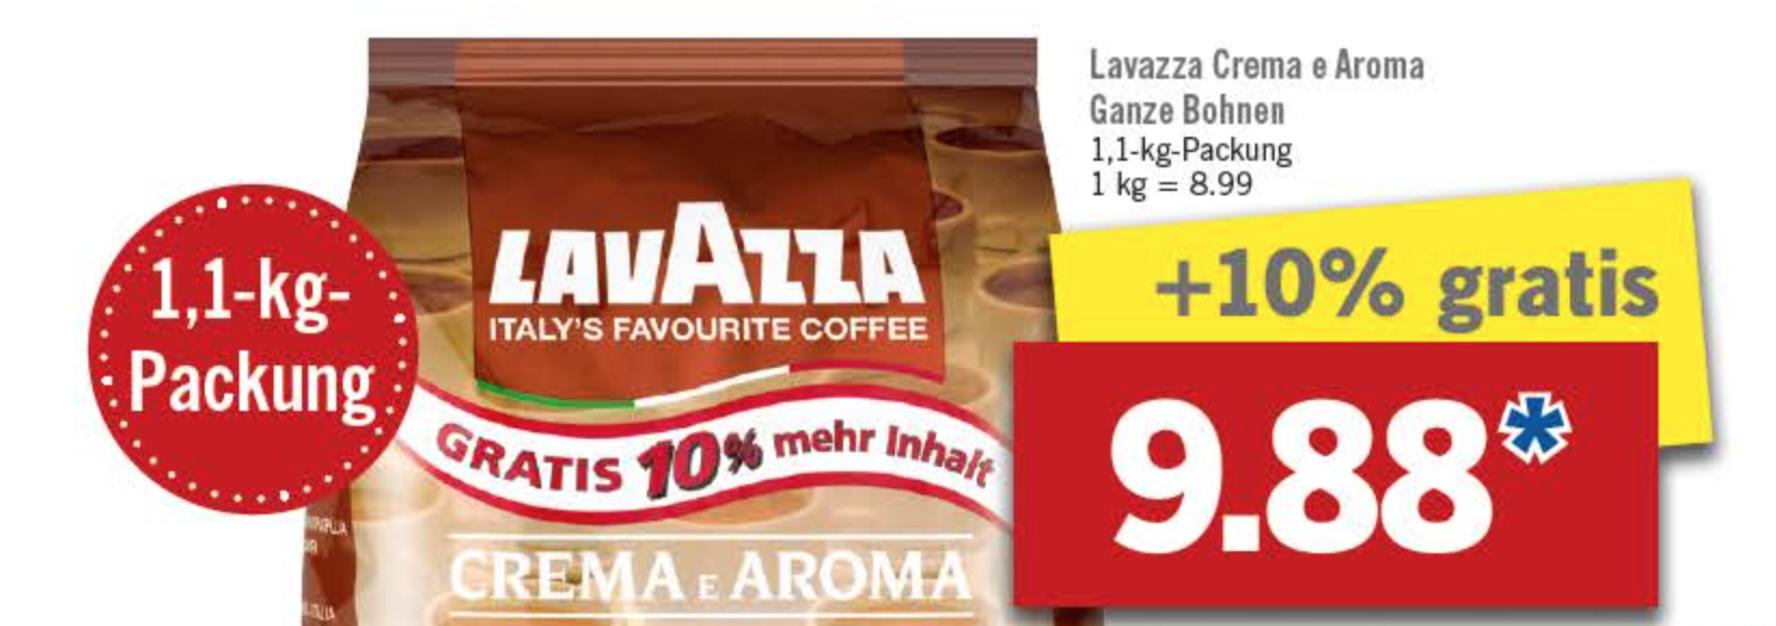 [Lidl] Lavazza Crema e Aroma Ganze Bohnen 1,1kg für 9,88€ ab 19.09.2016